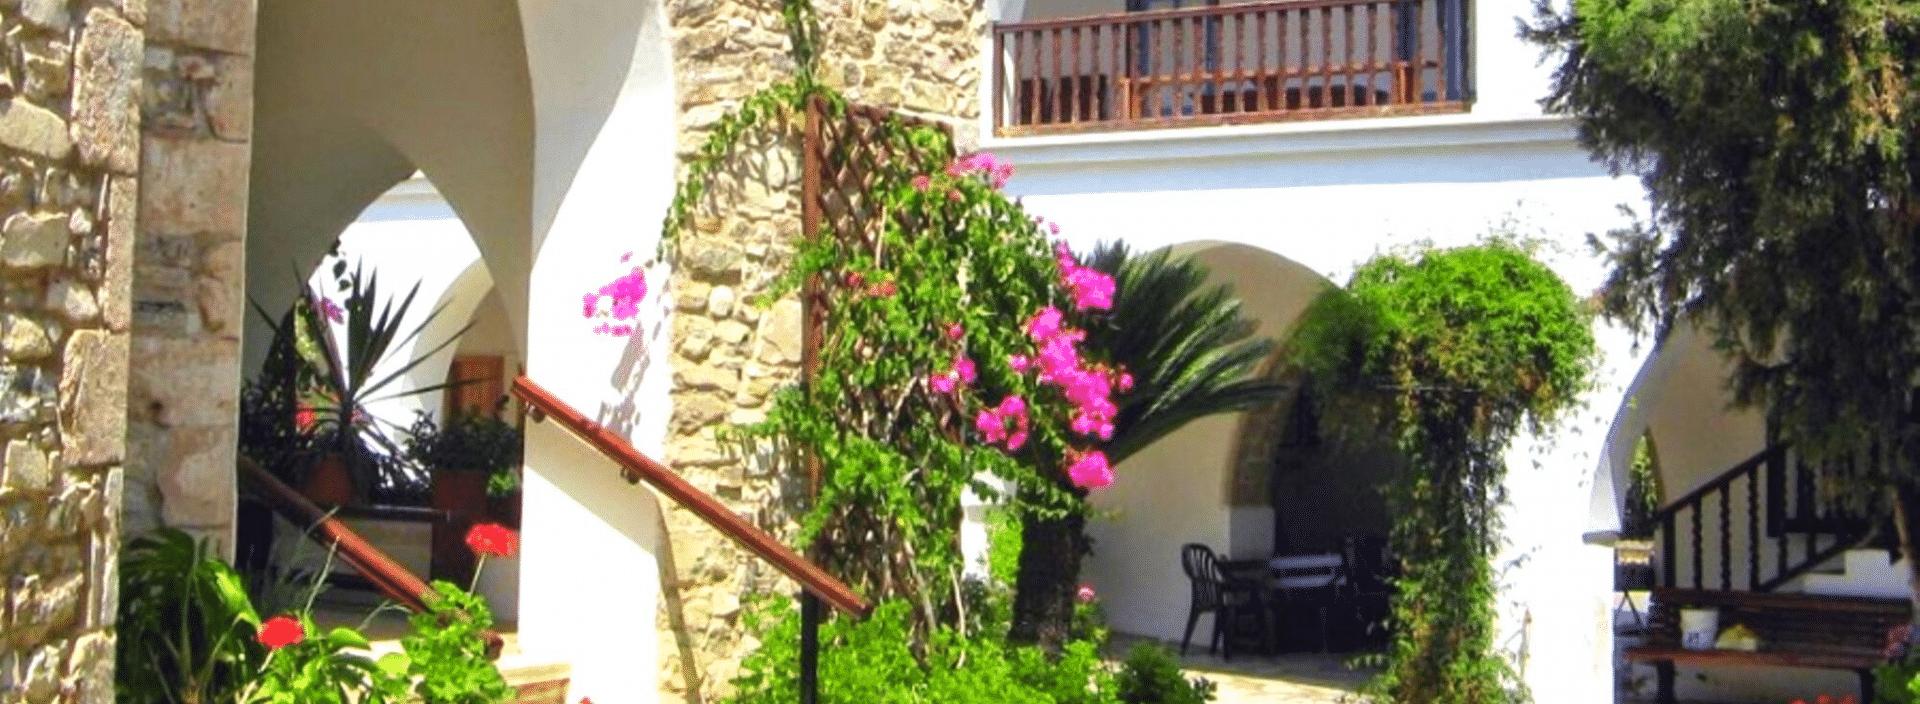 Larnaca Monasteries